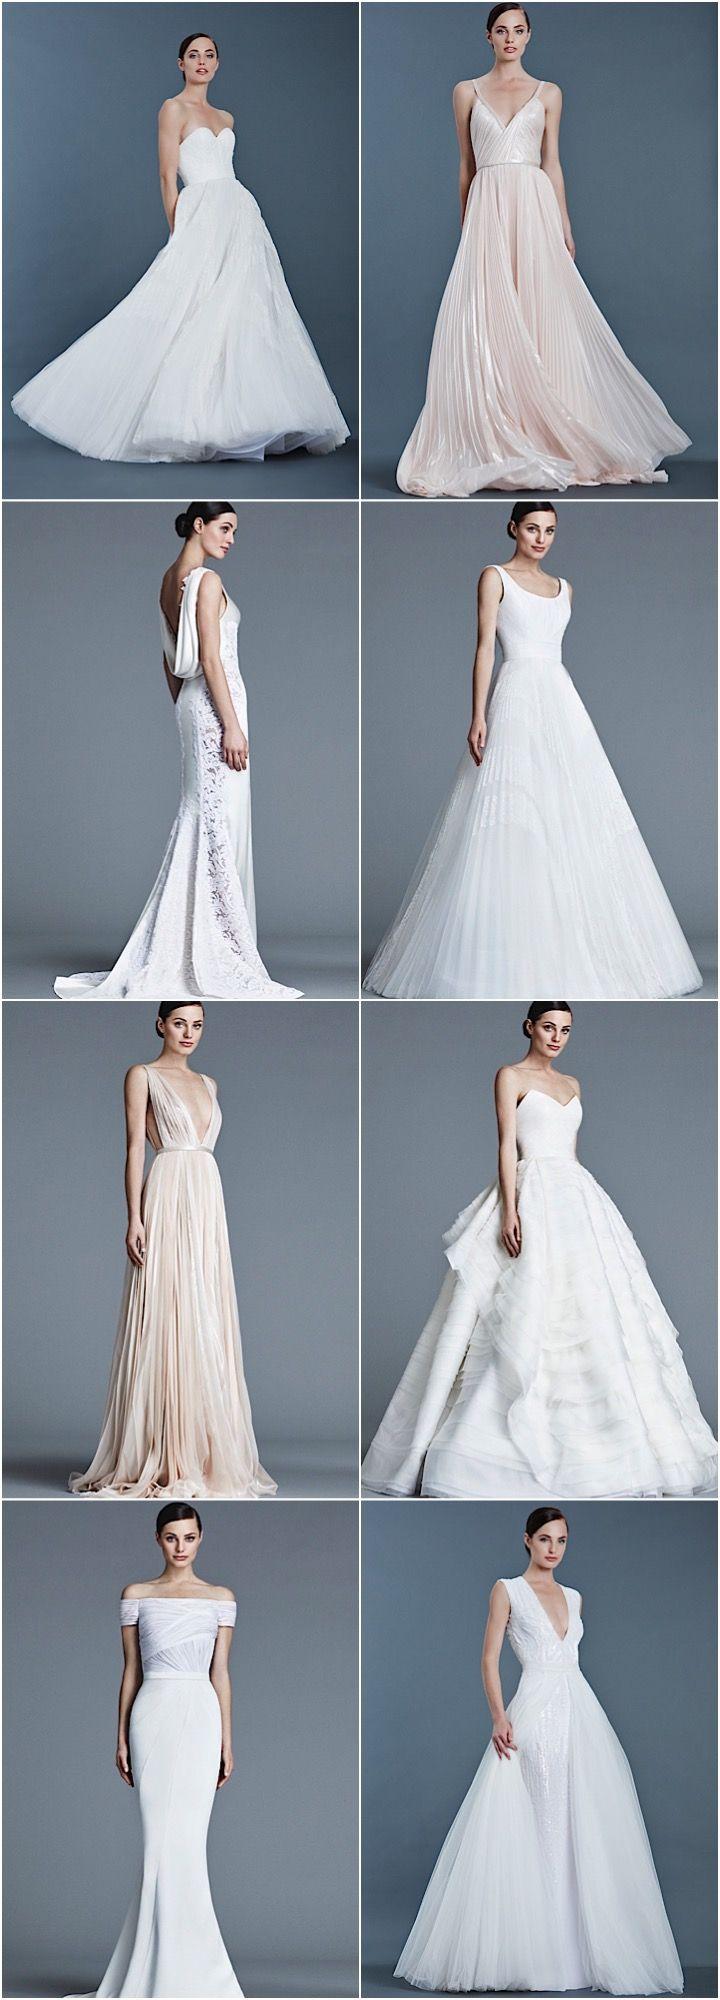 J Mendel Wedding Dresses